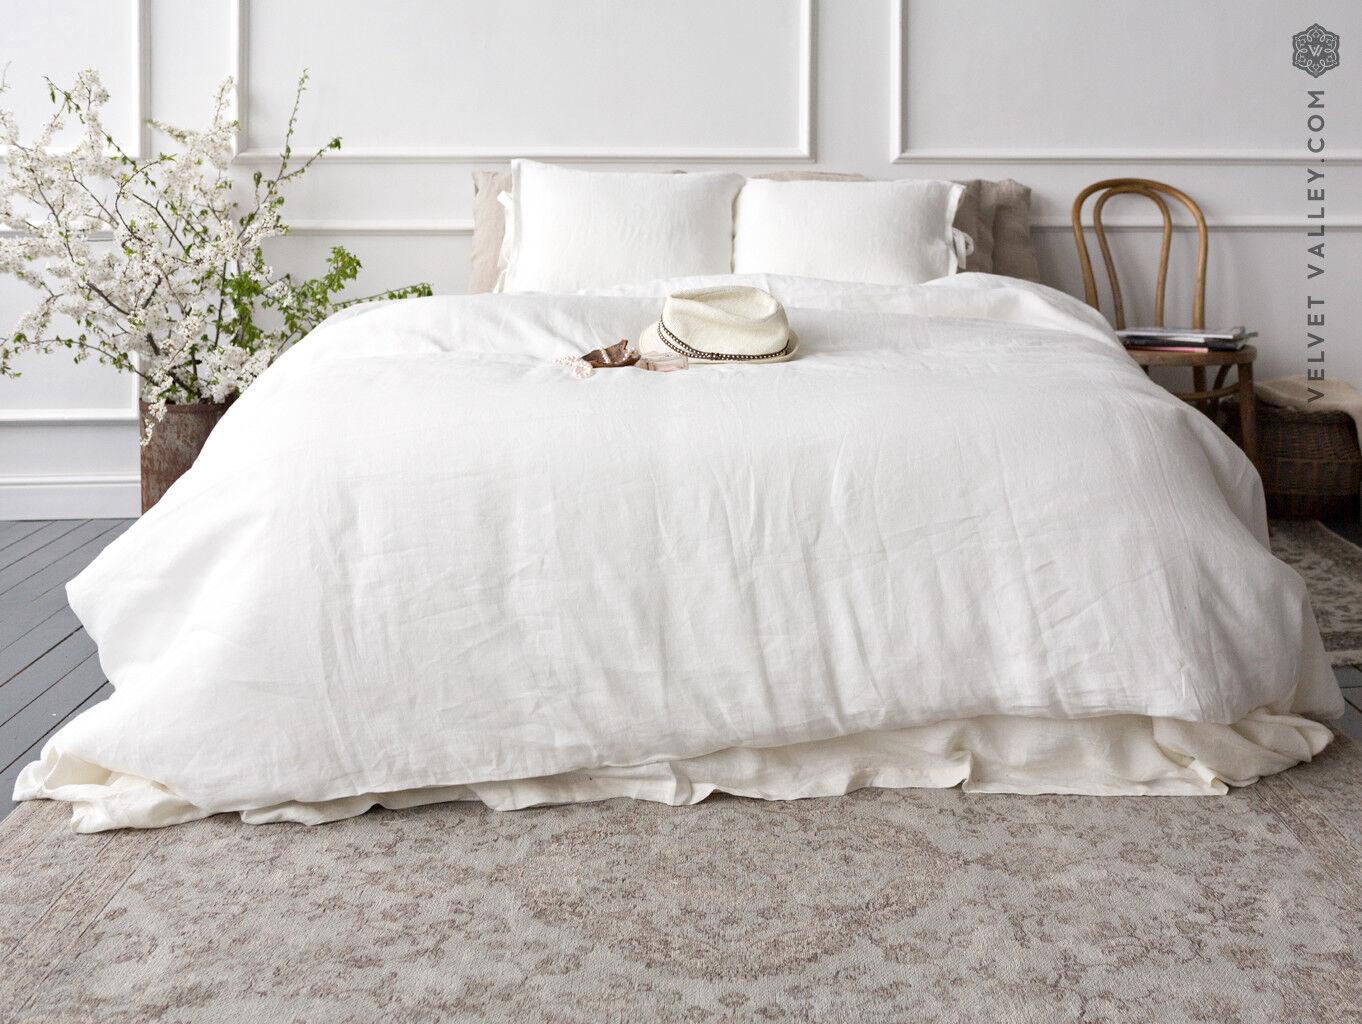 Linen optical bianca duvet cover- True bianca stone washed linen doona cover